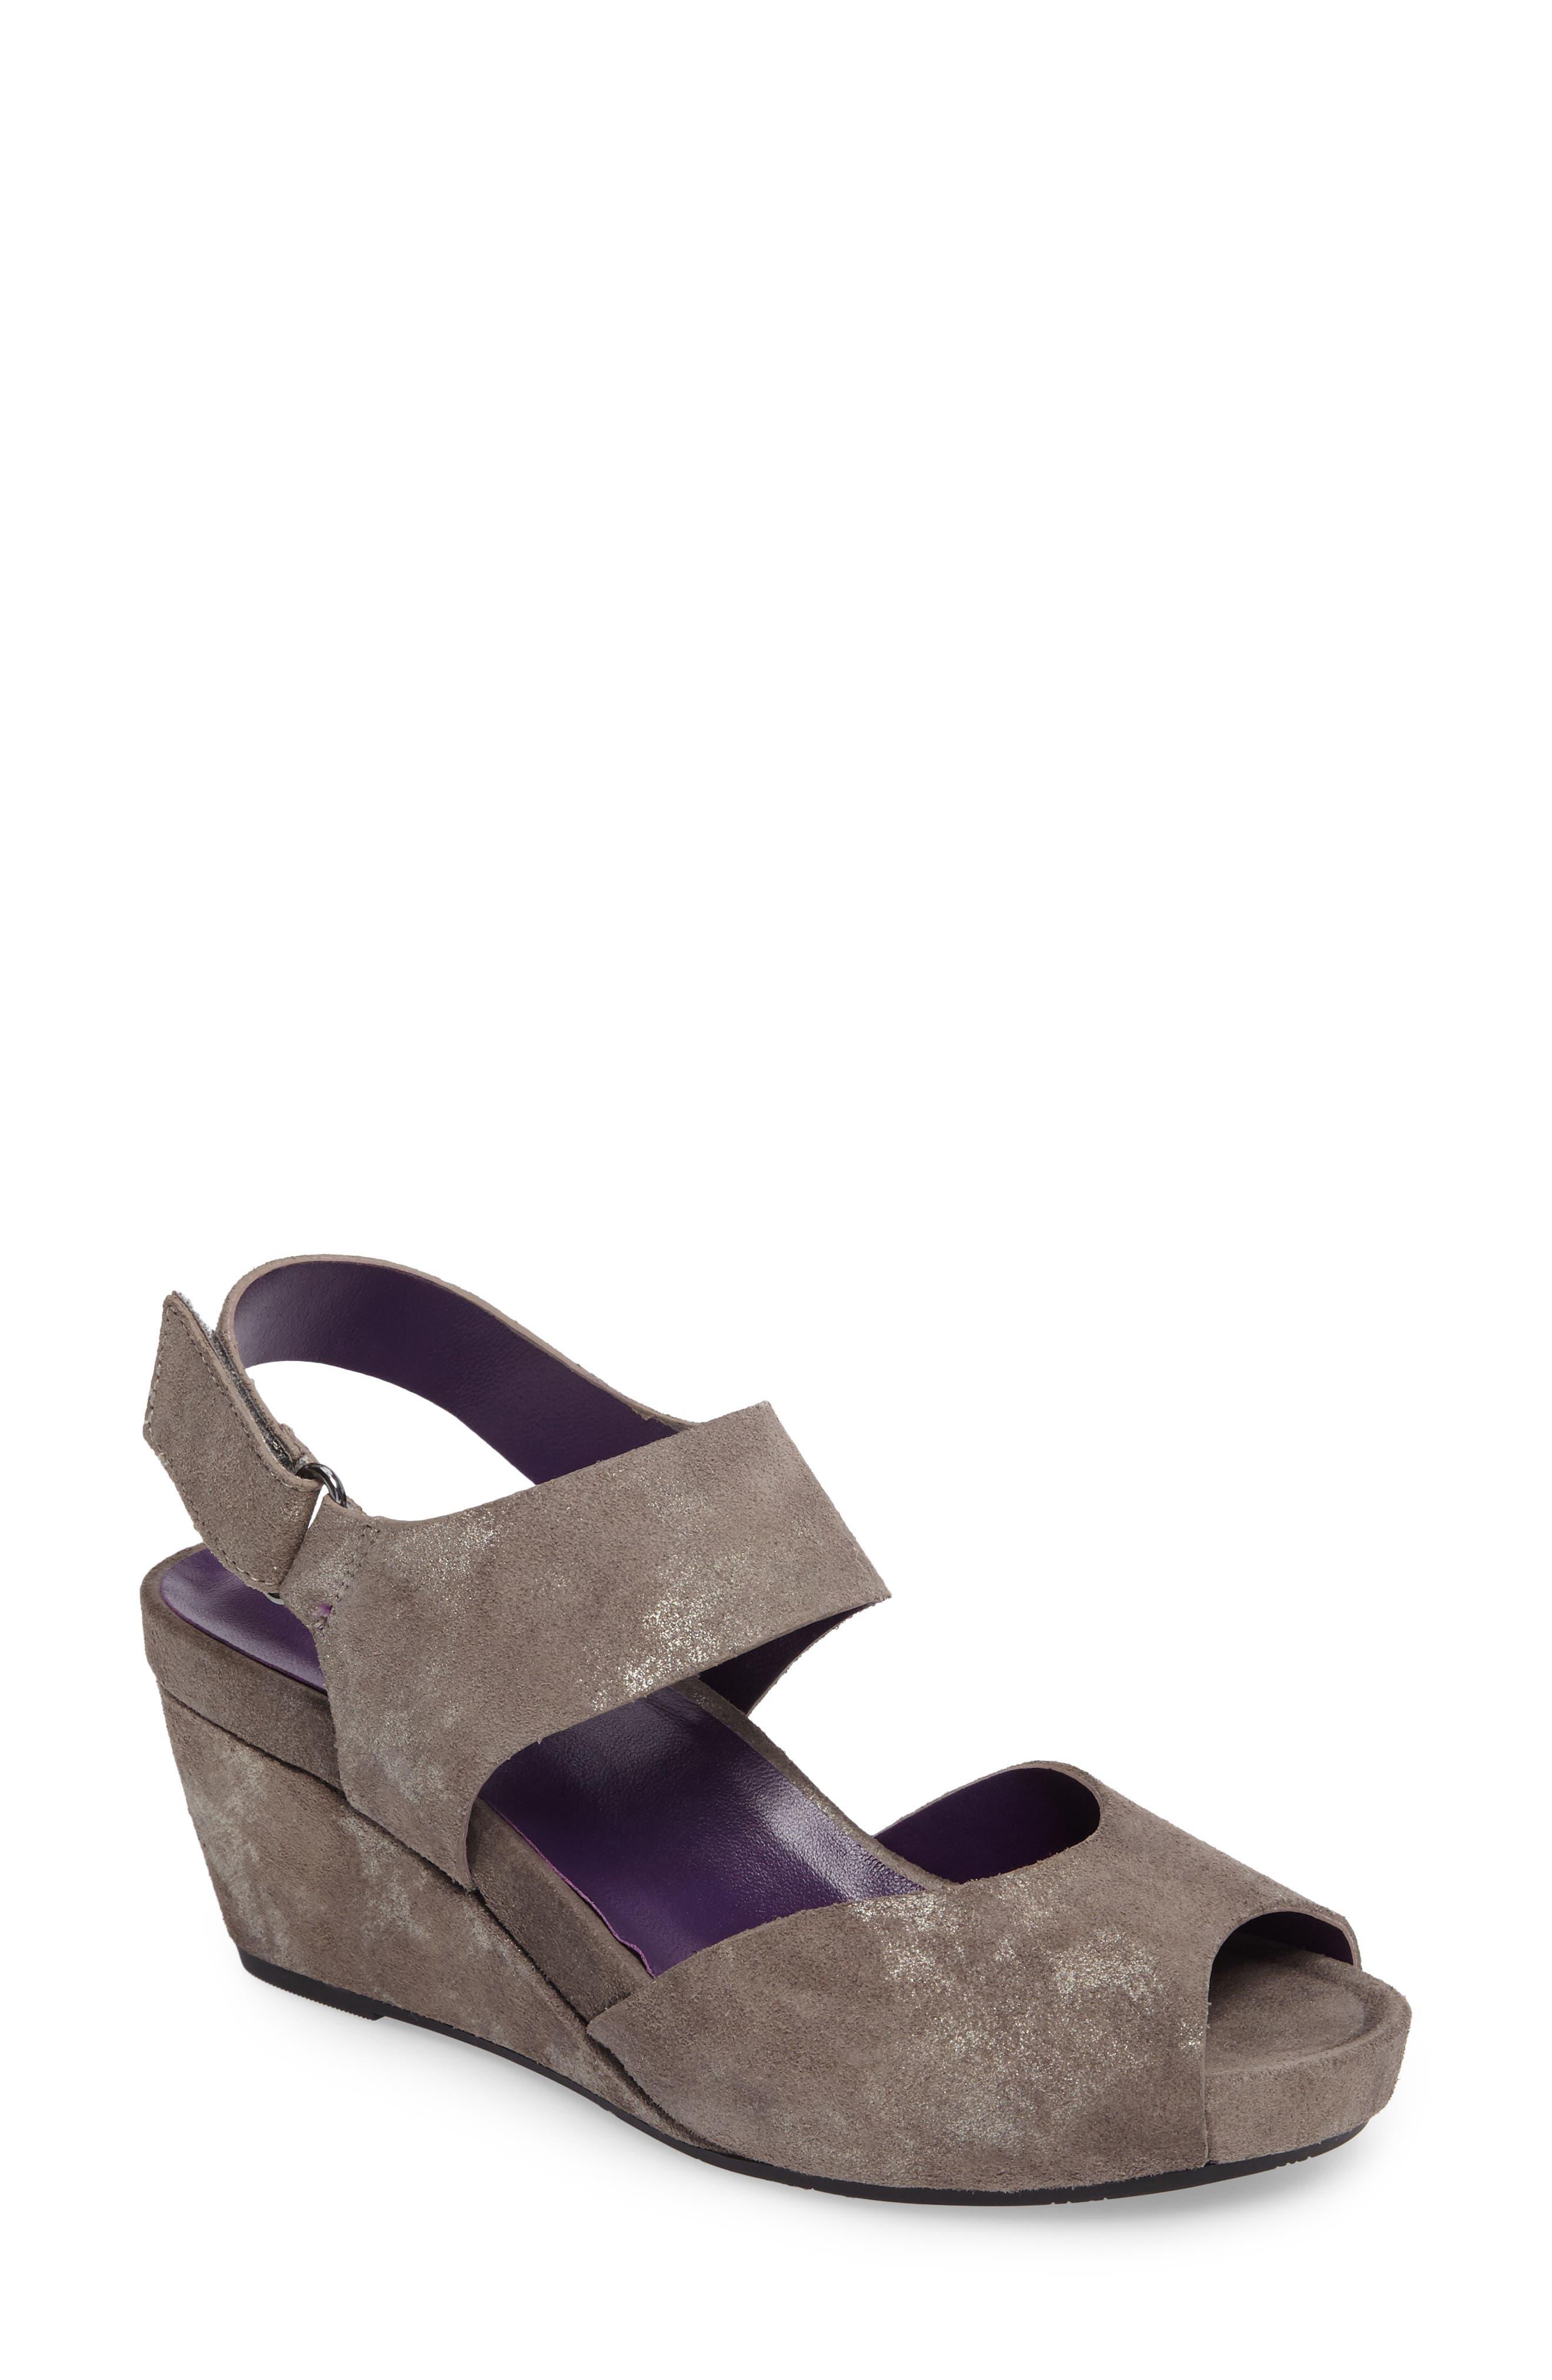 Ilex Wedge Sandal,                         Main,                         color, 251